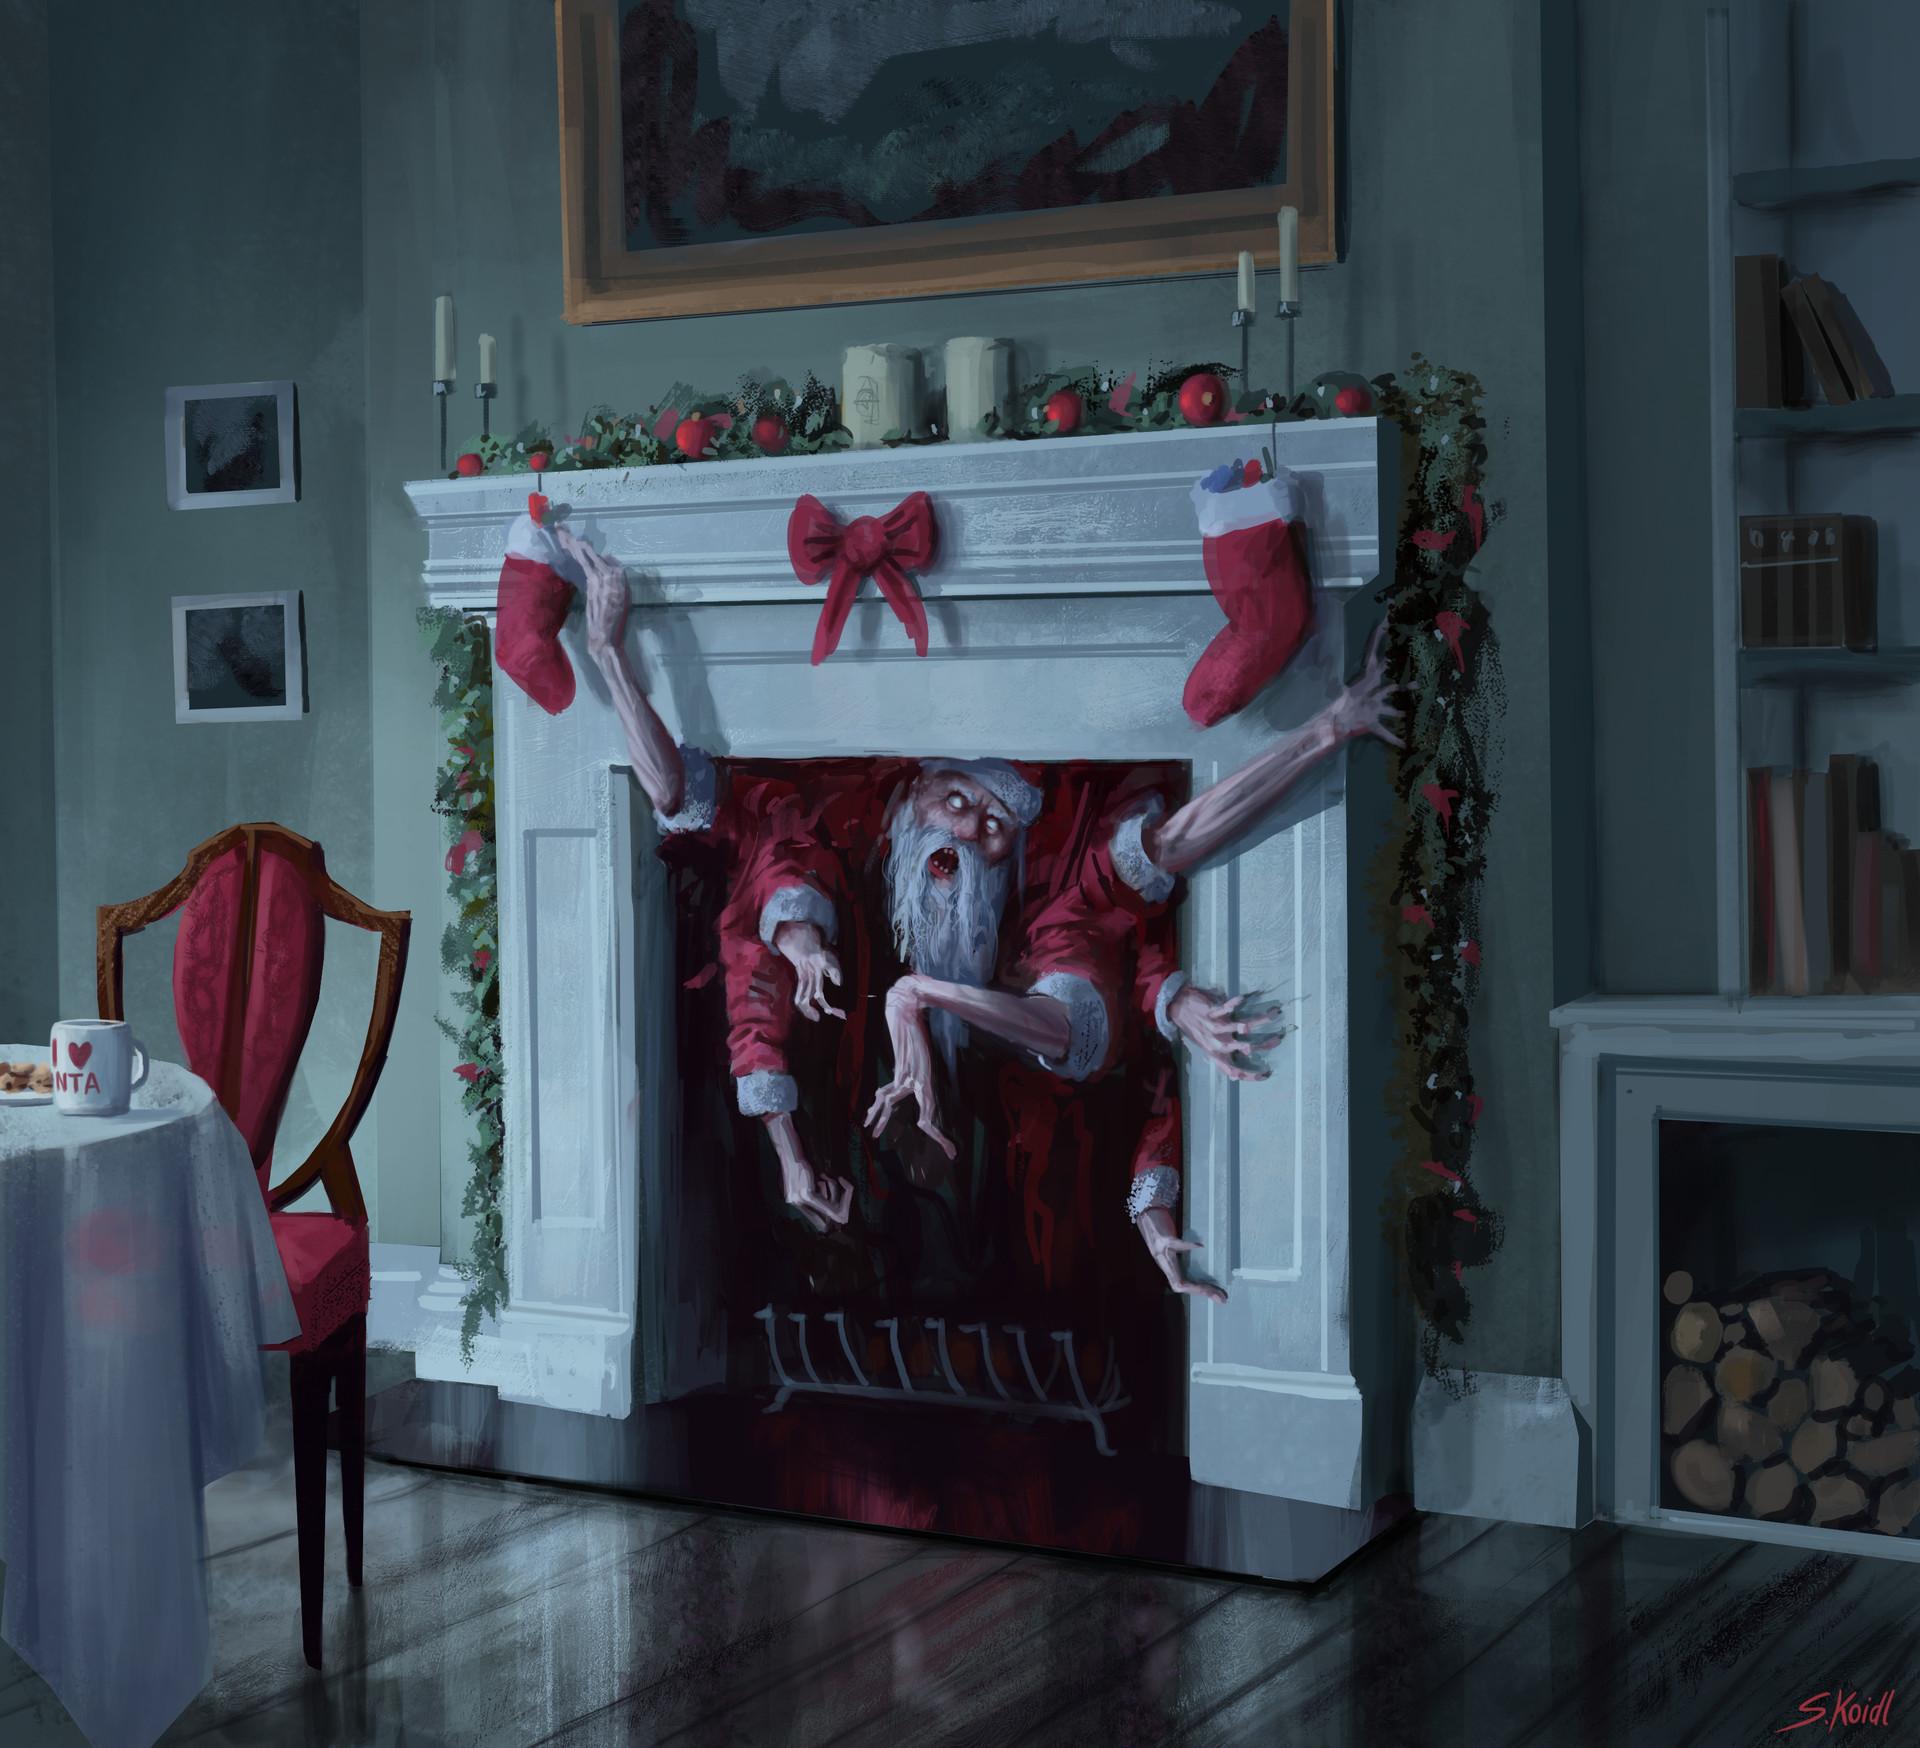 Stefan Koidl, Santa is coming, arte digitale